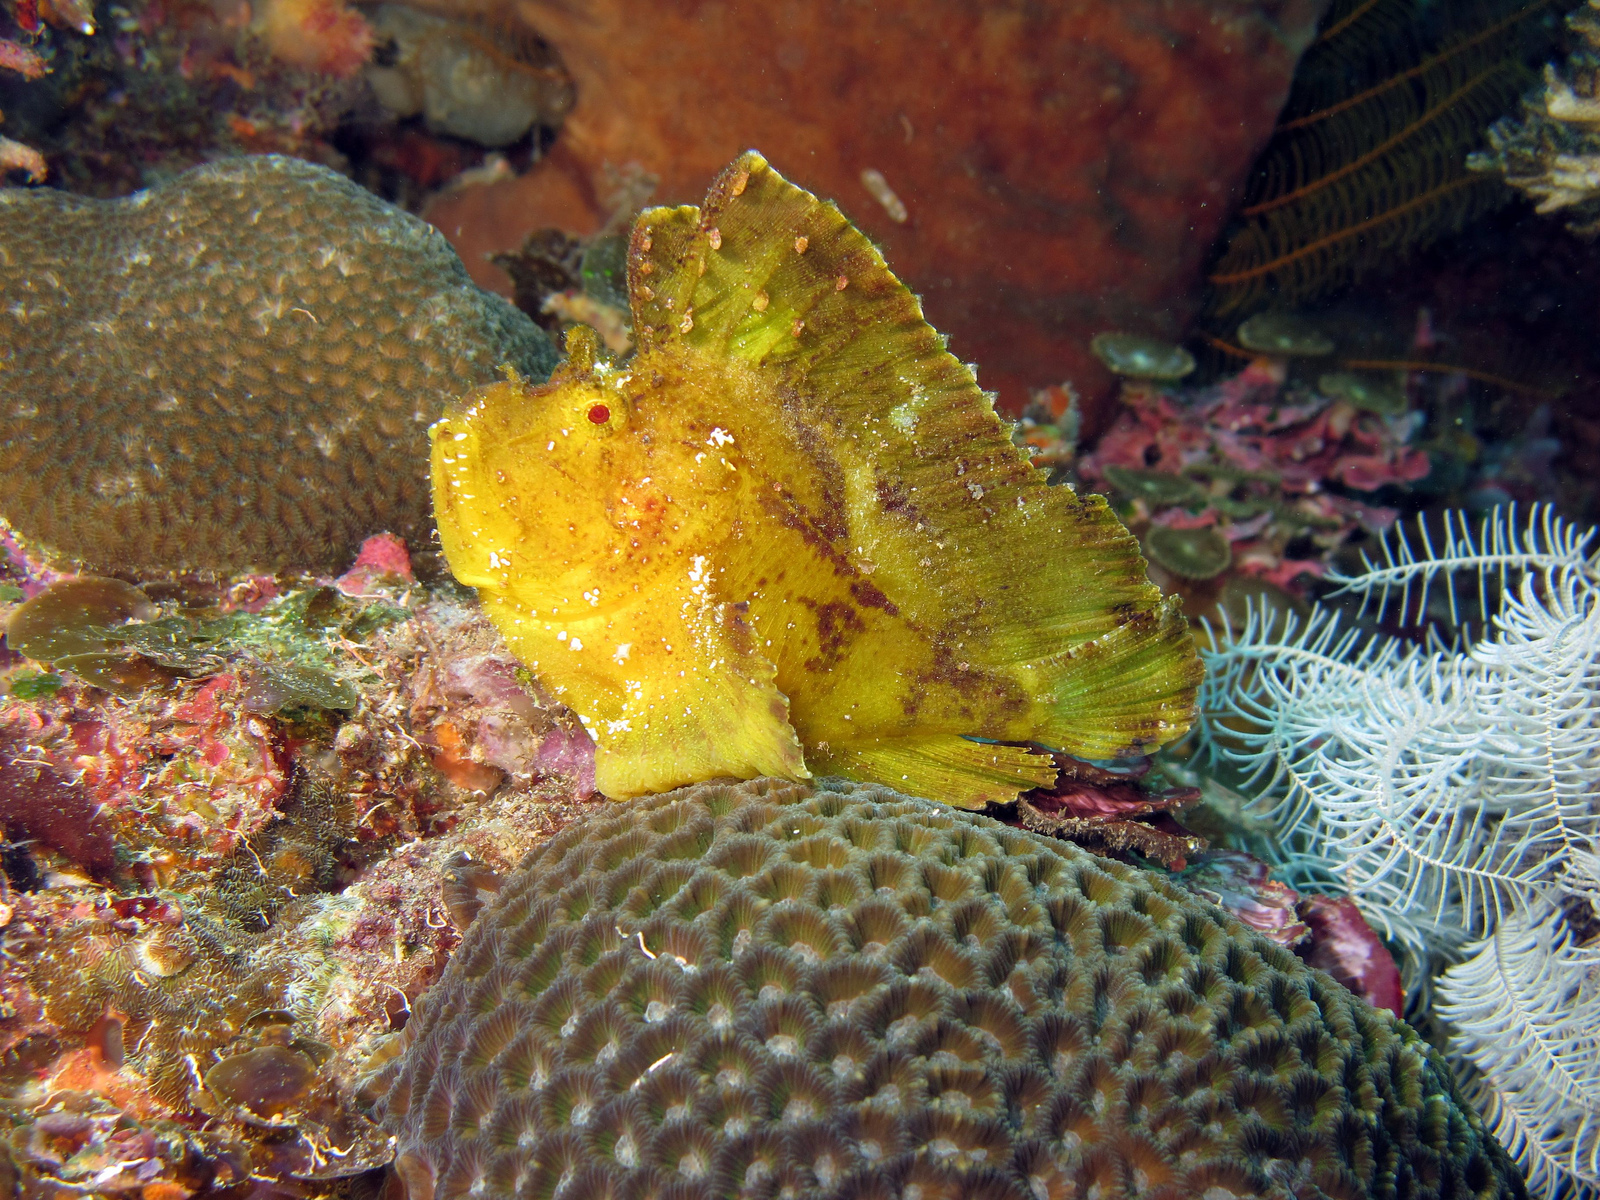 leaf scorpionfish - photo #7